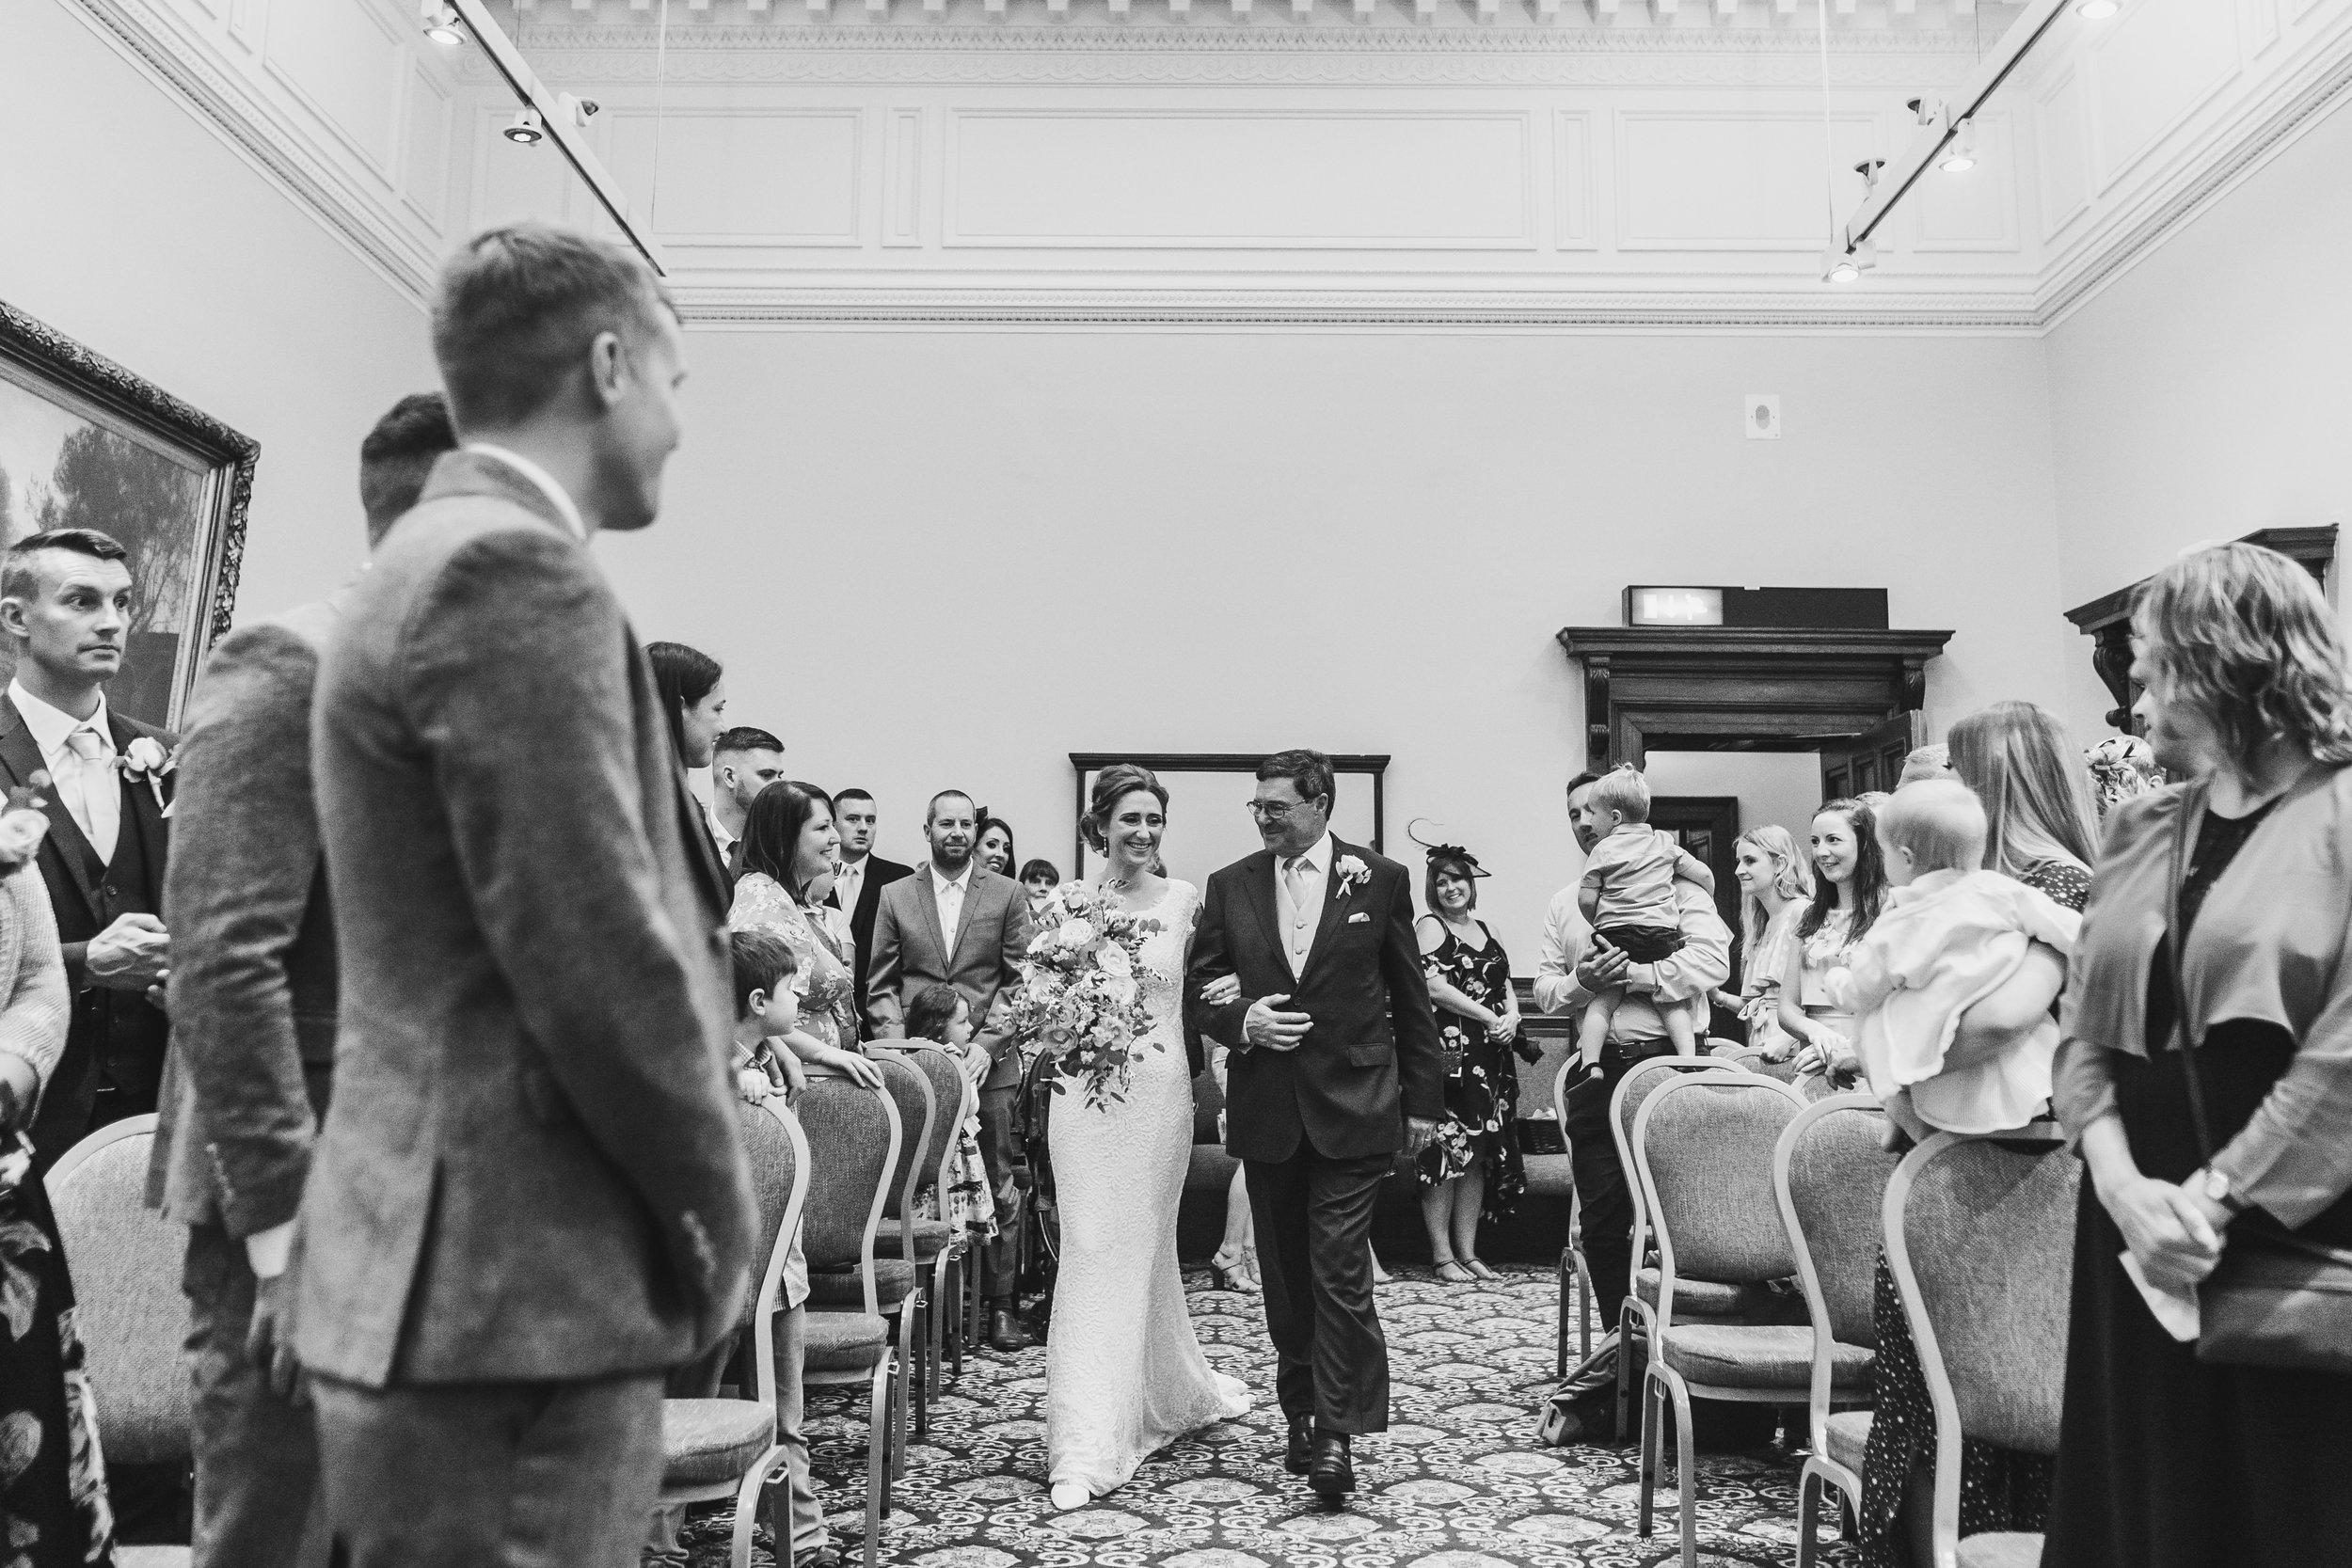 st-georges-hall-liverpool-wedding-76.jpg